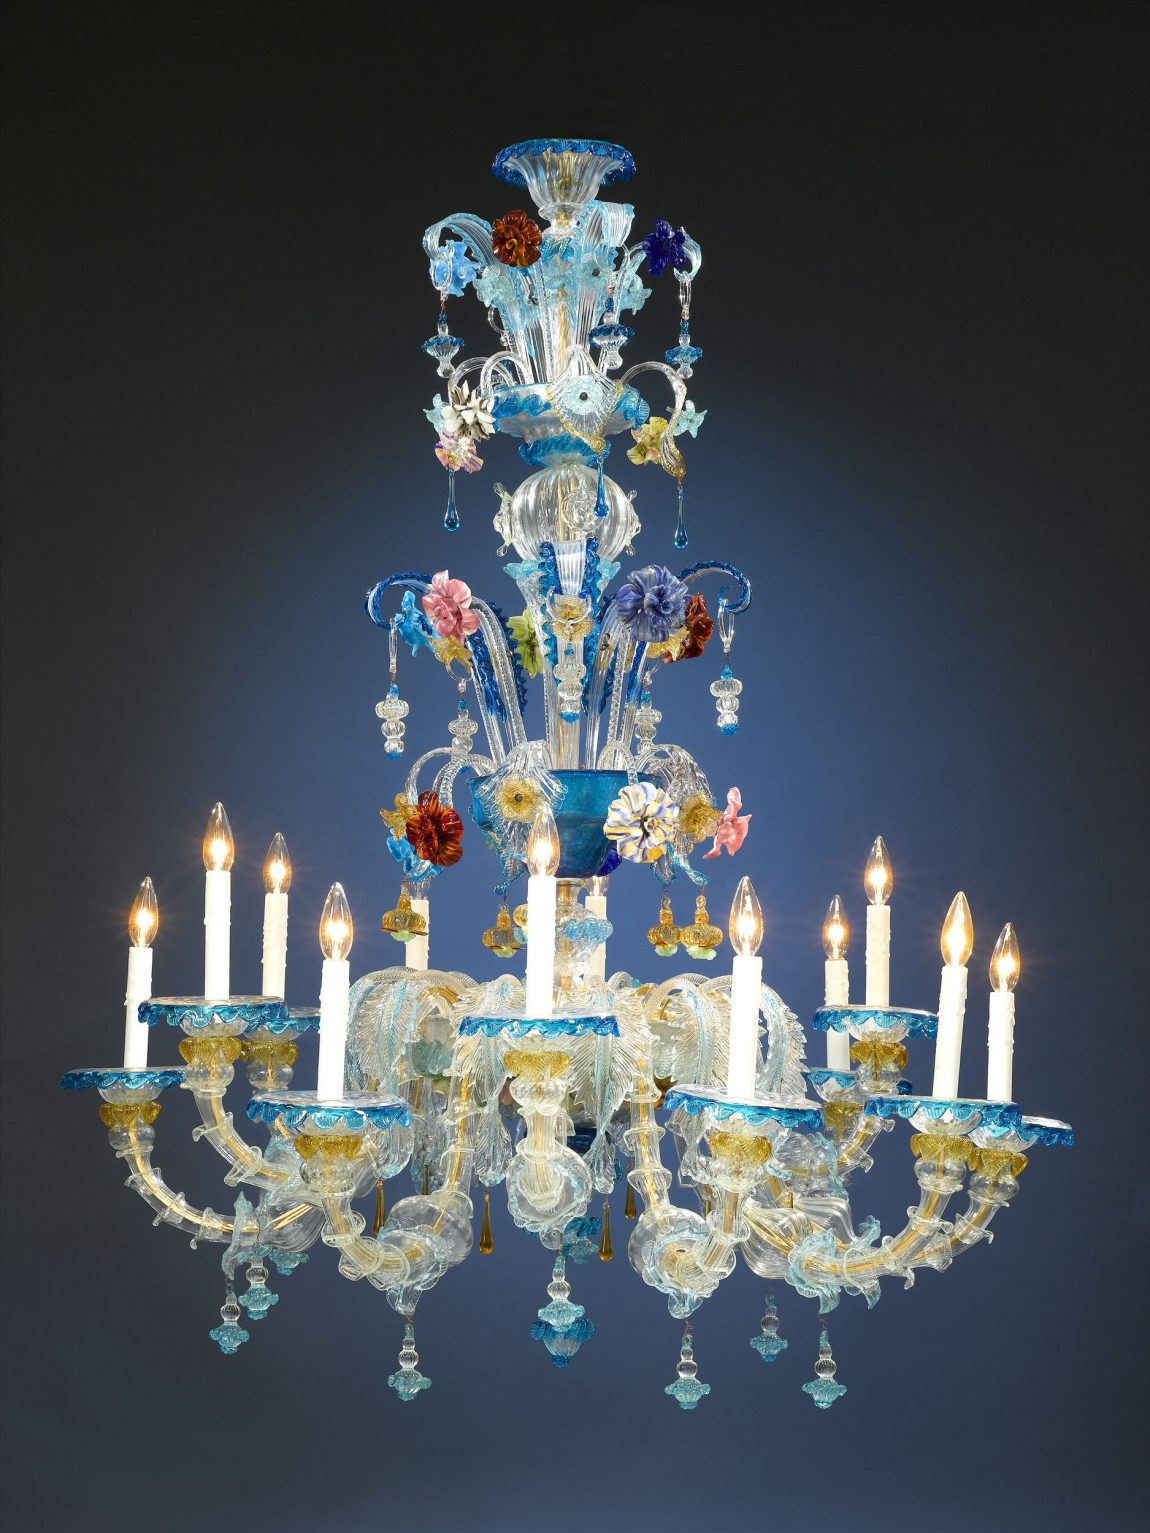 Murano Glass Venetian Chandeliers